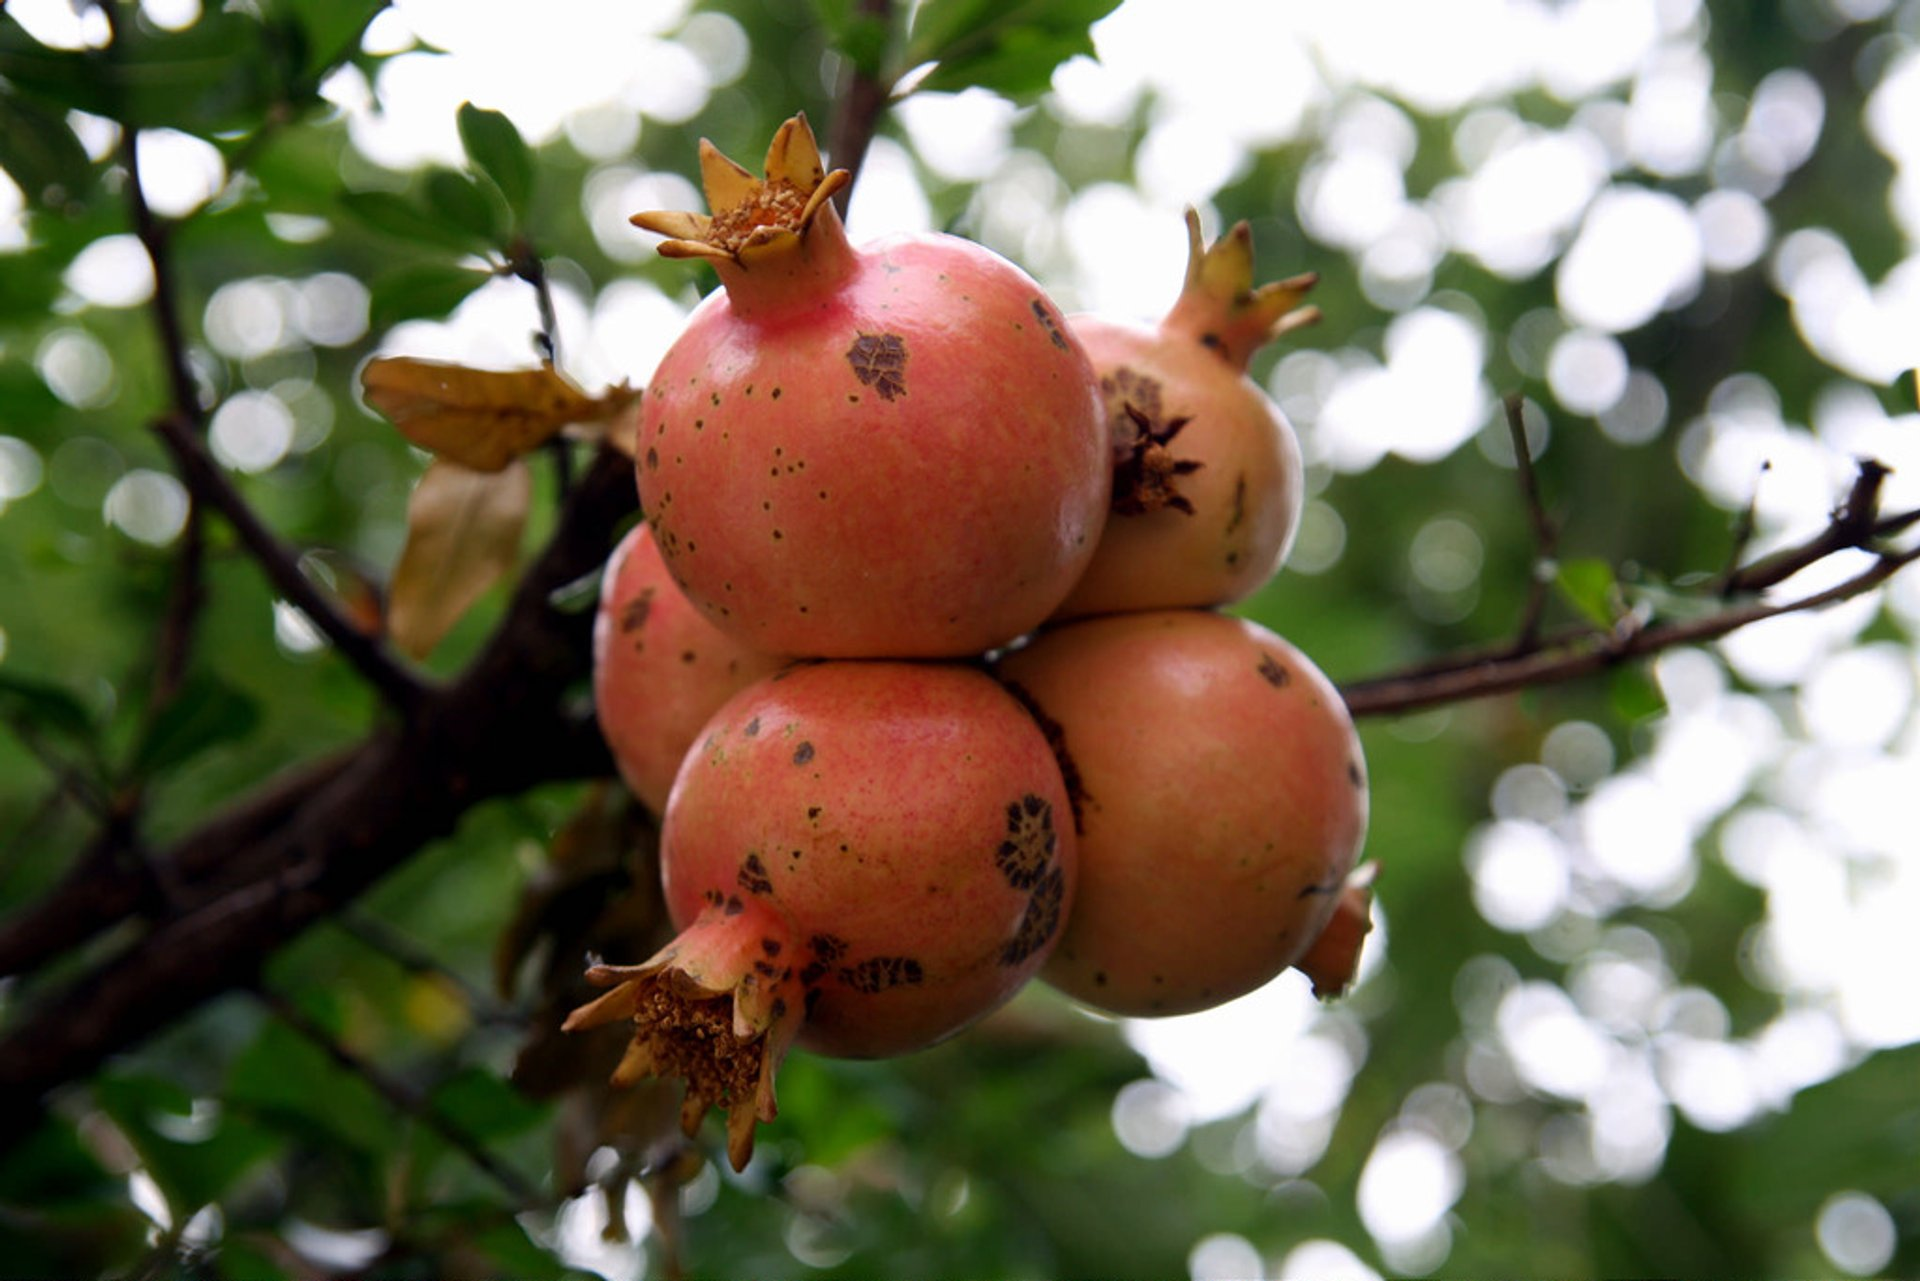 Pomegranate in Montenegro - Best Season 2020